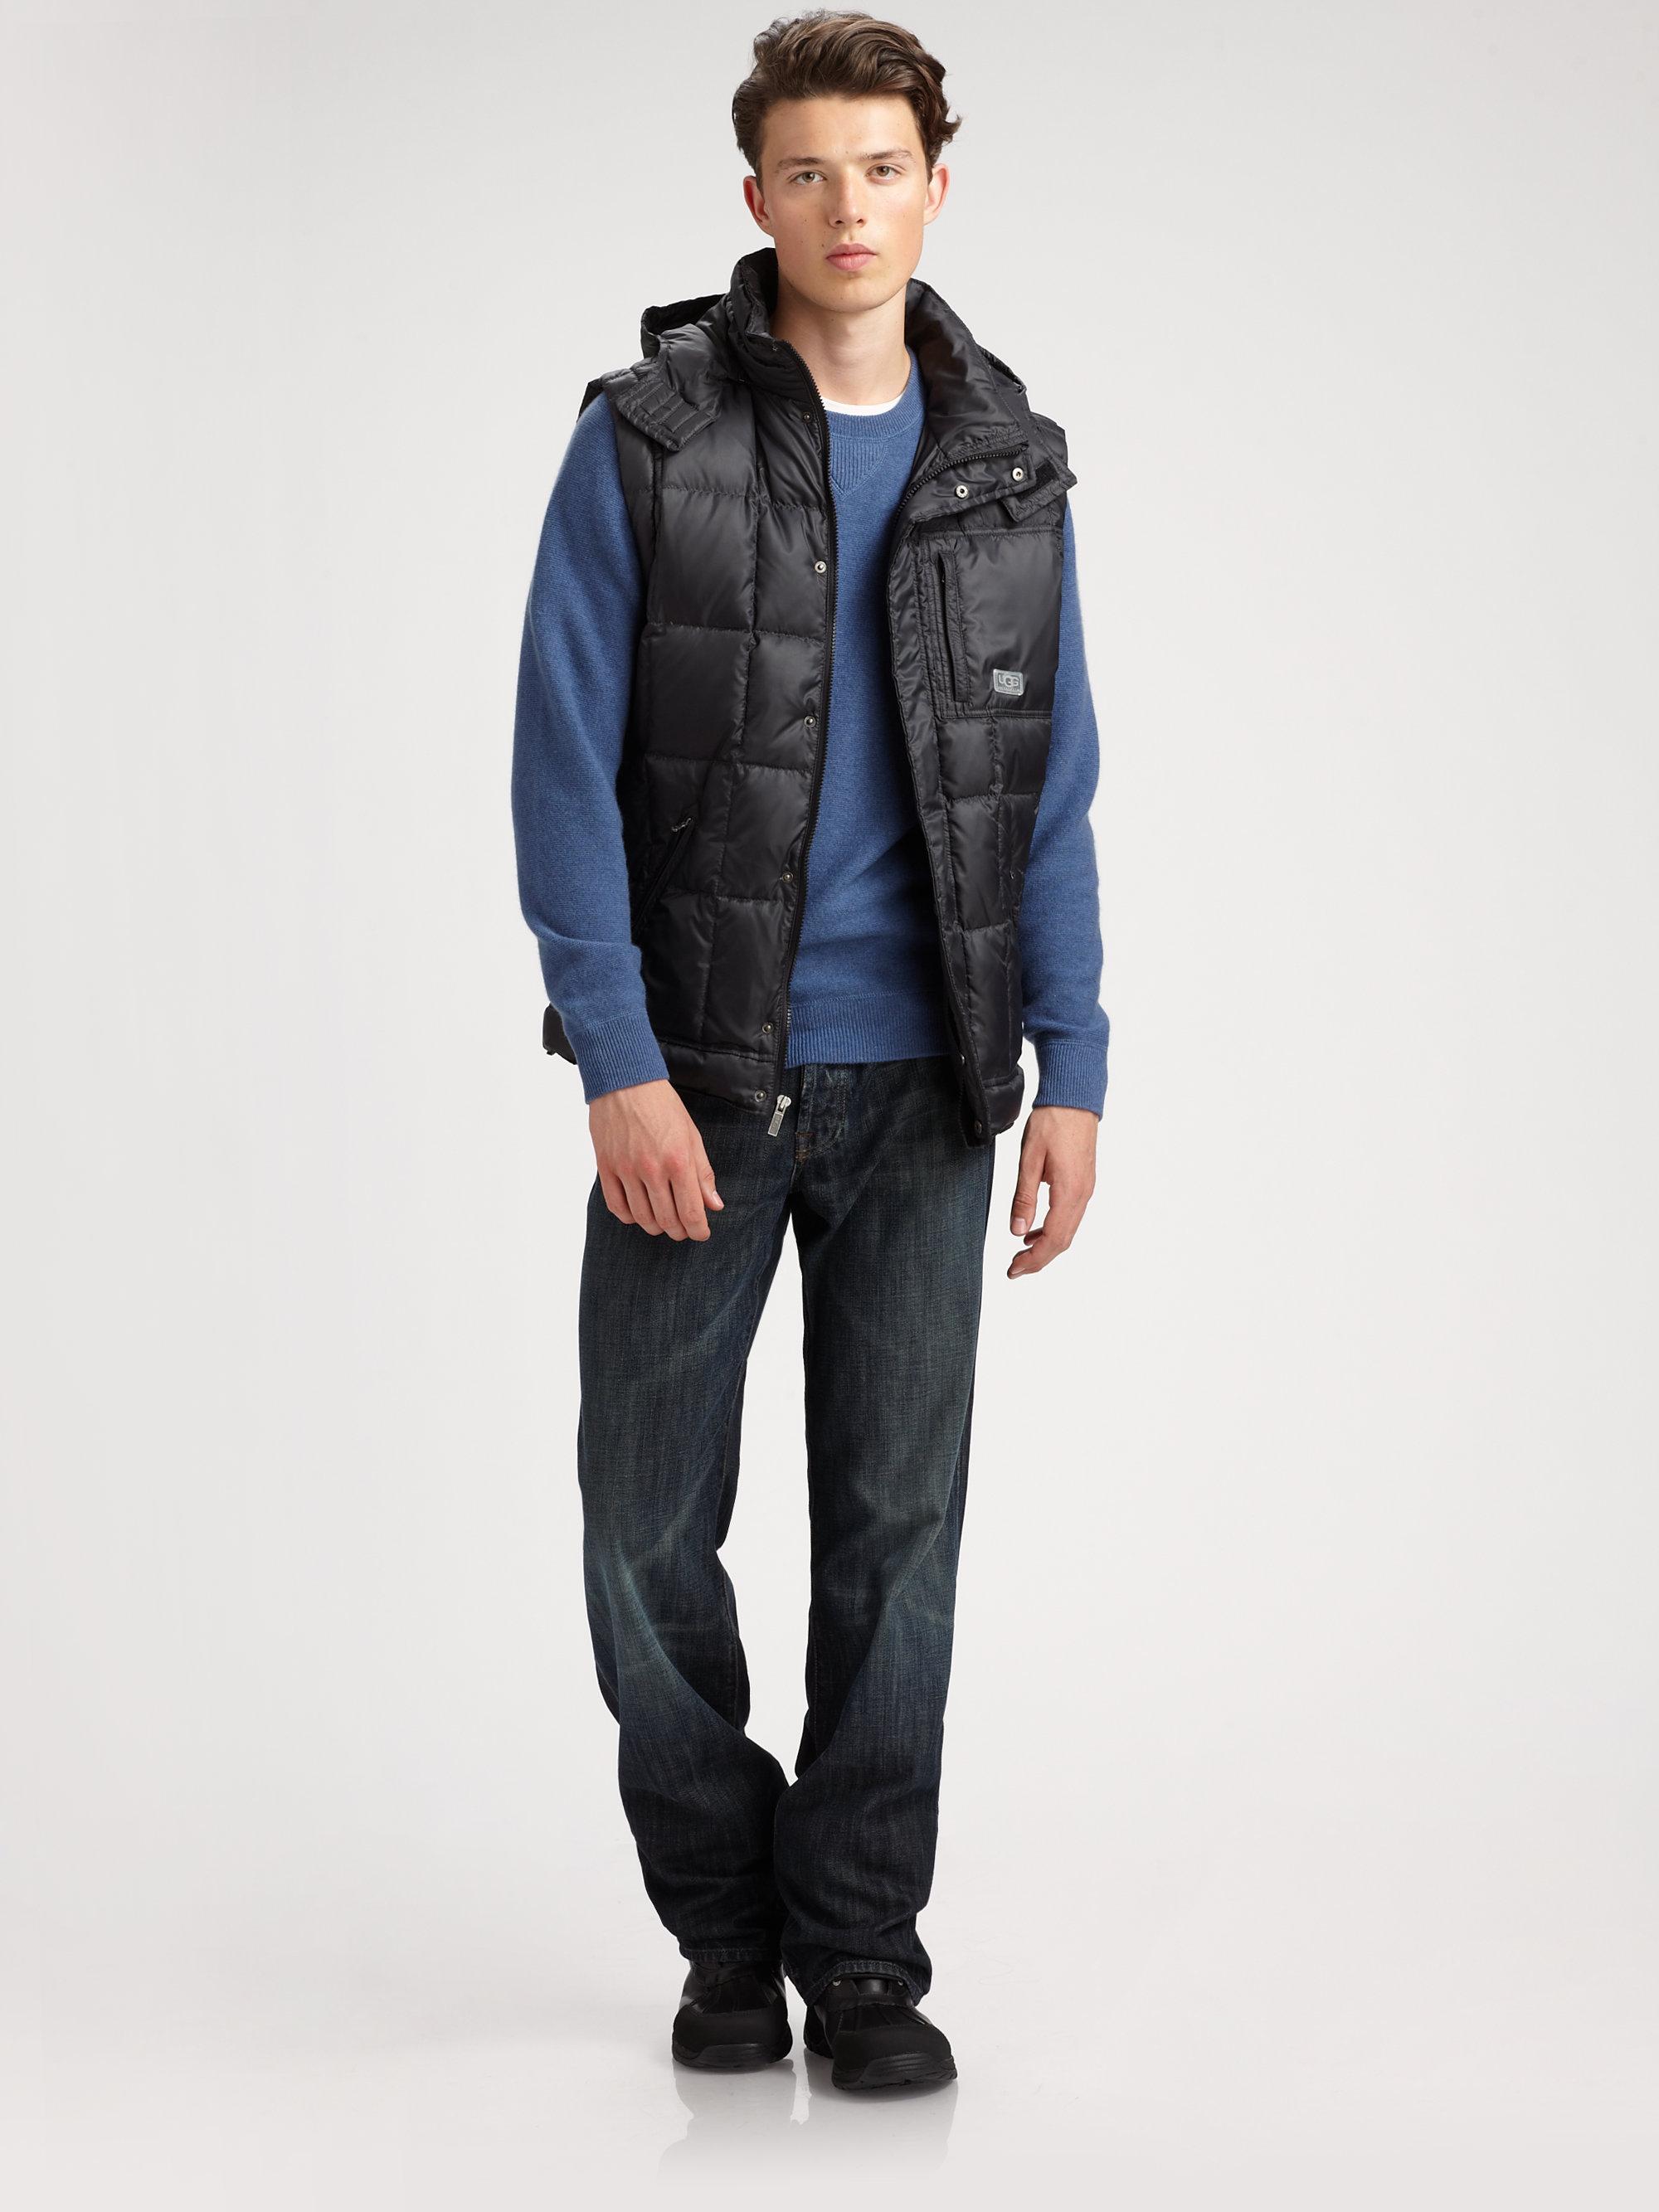 Ugg Poia Puffer Vest In Black For Men Lyst